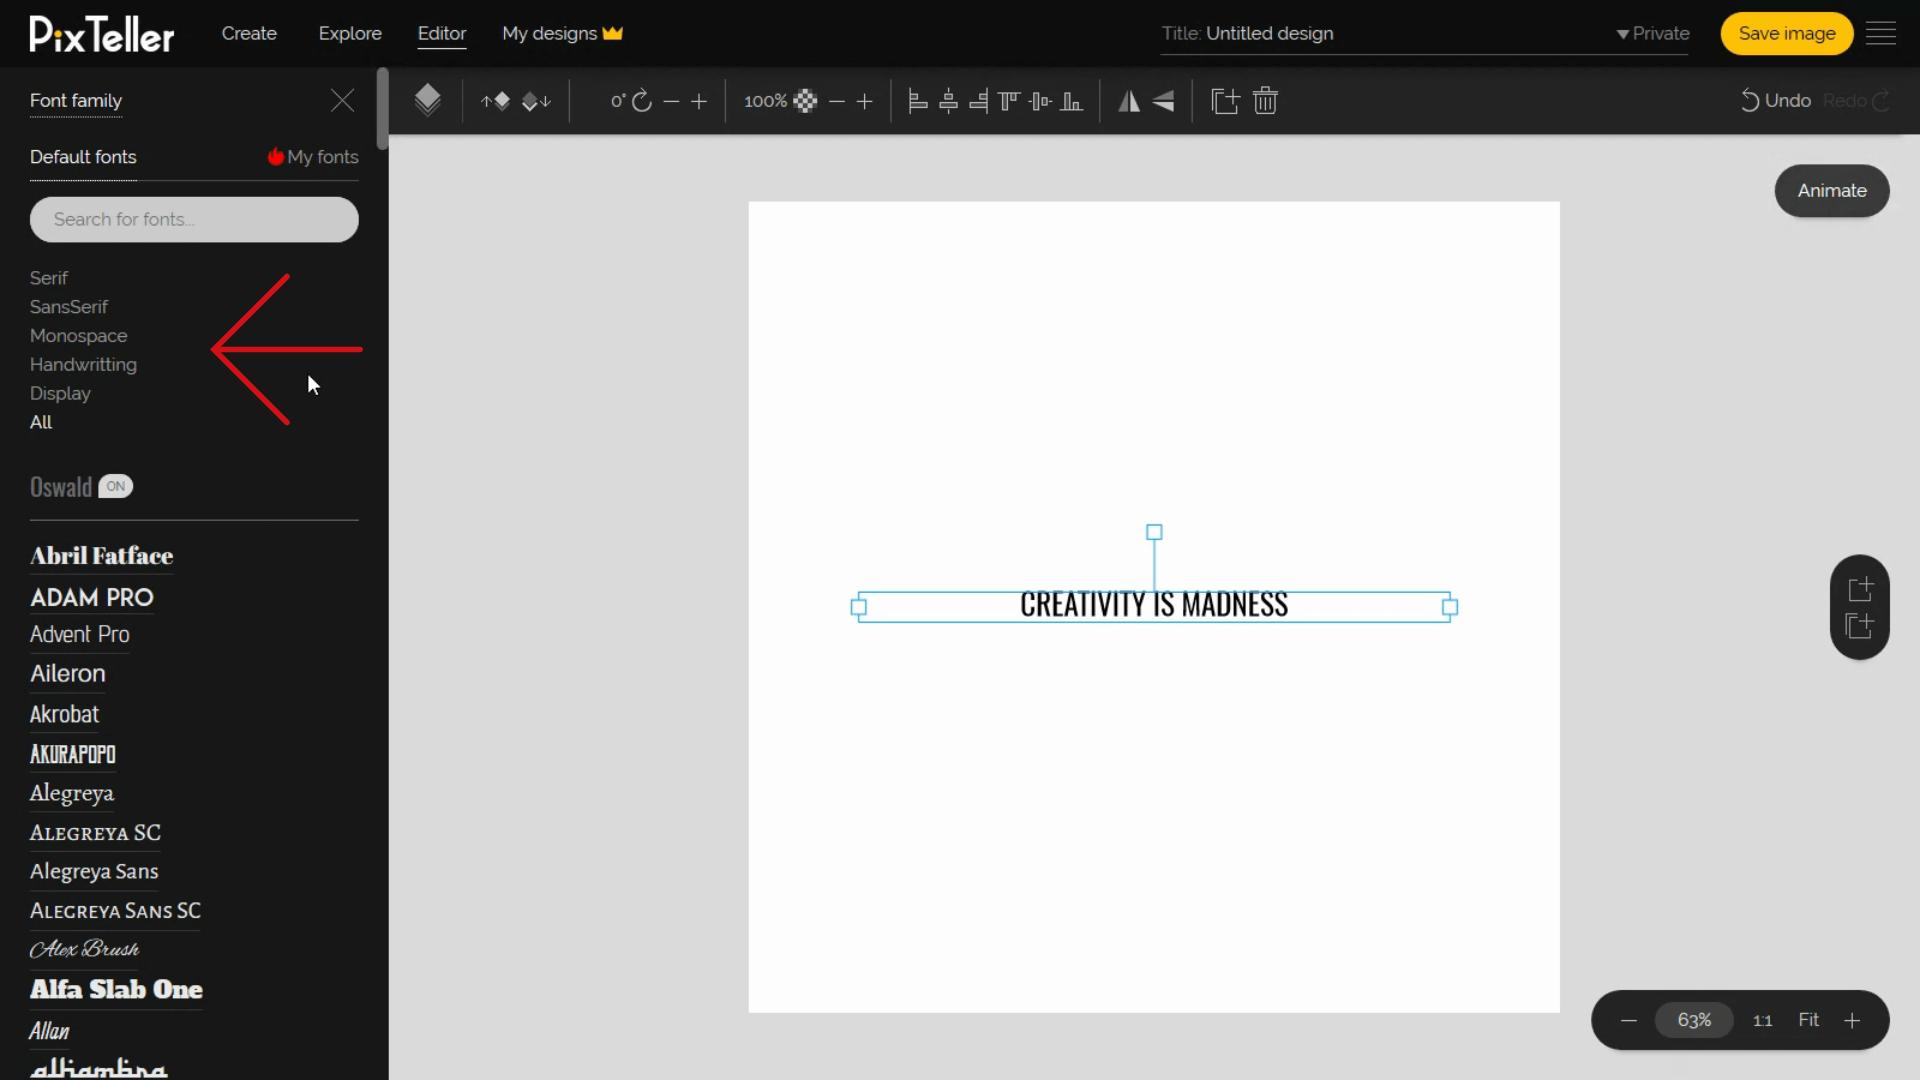 Change font family button